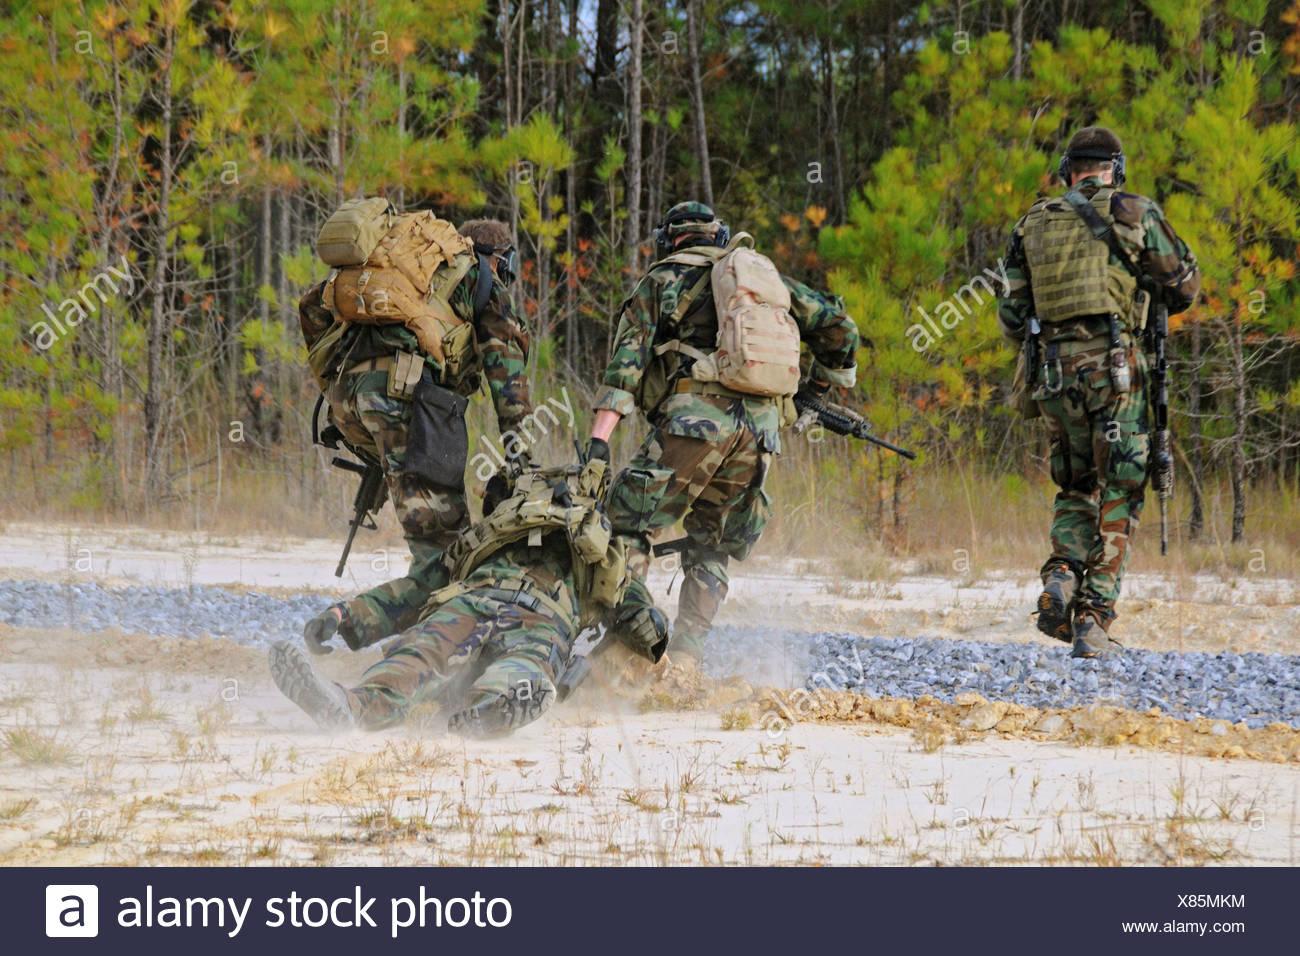 Navy SEALs Simulate Evacuation Injured Teammate - Stock Image